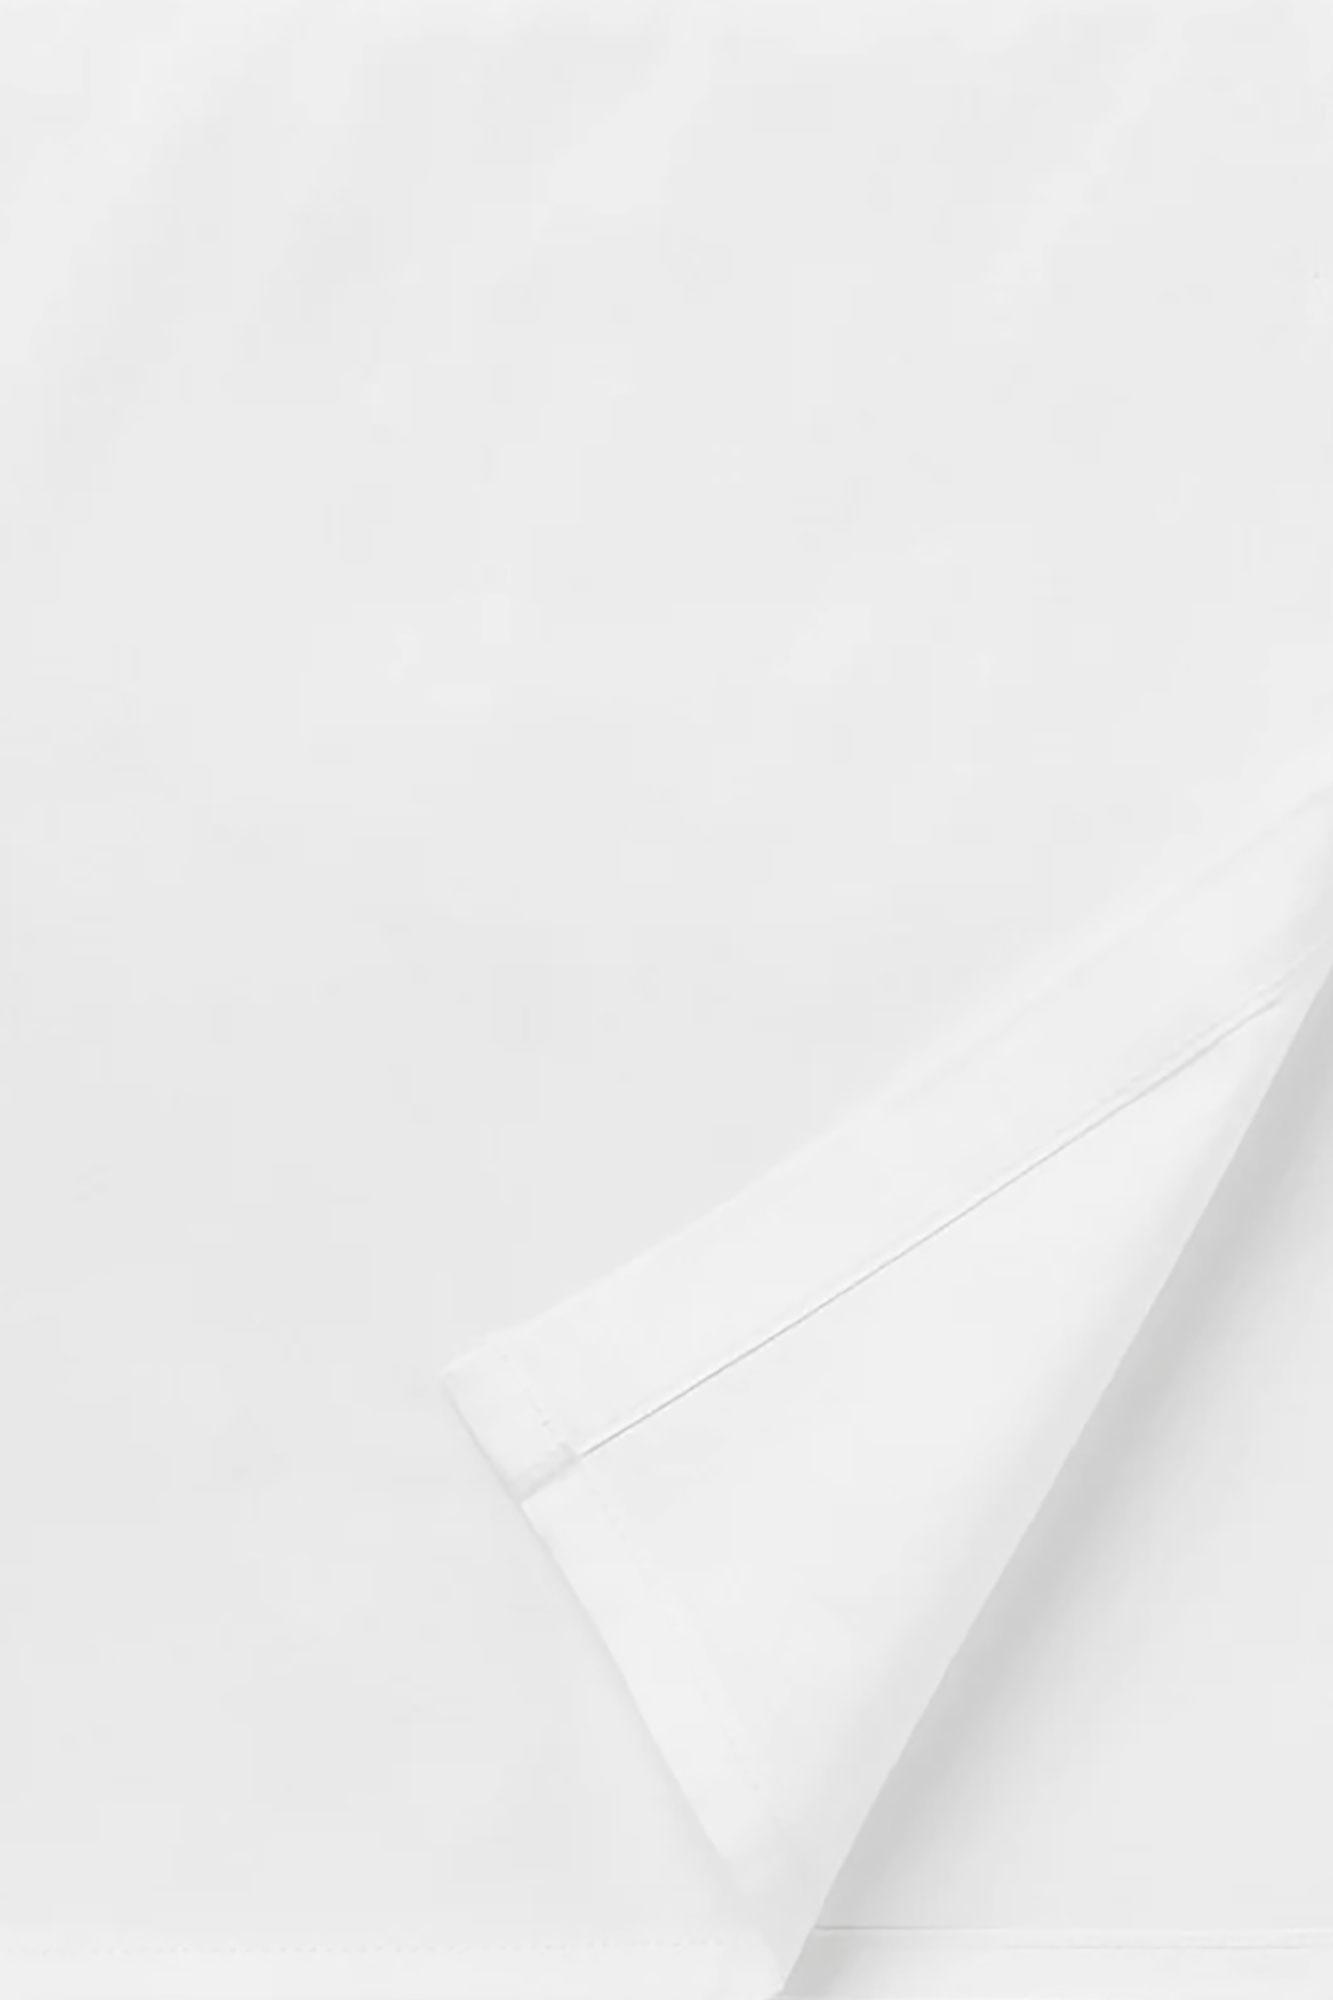 Lençol de cobrir mini cama Branco